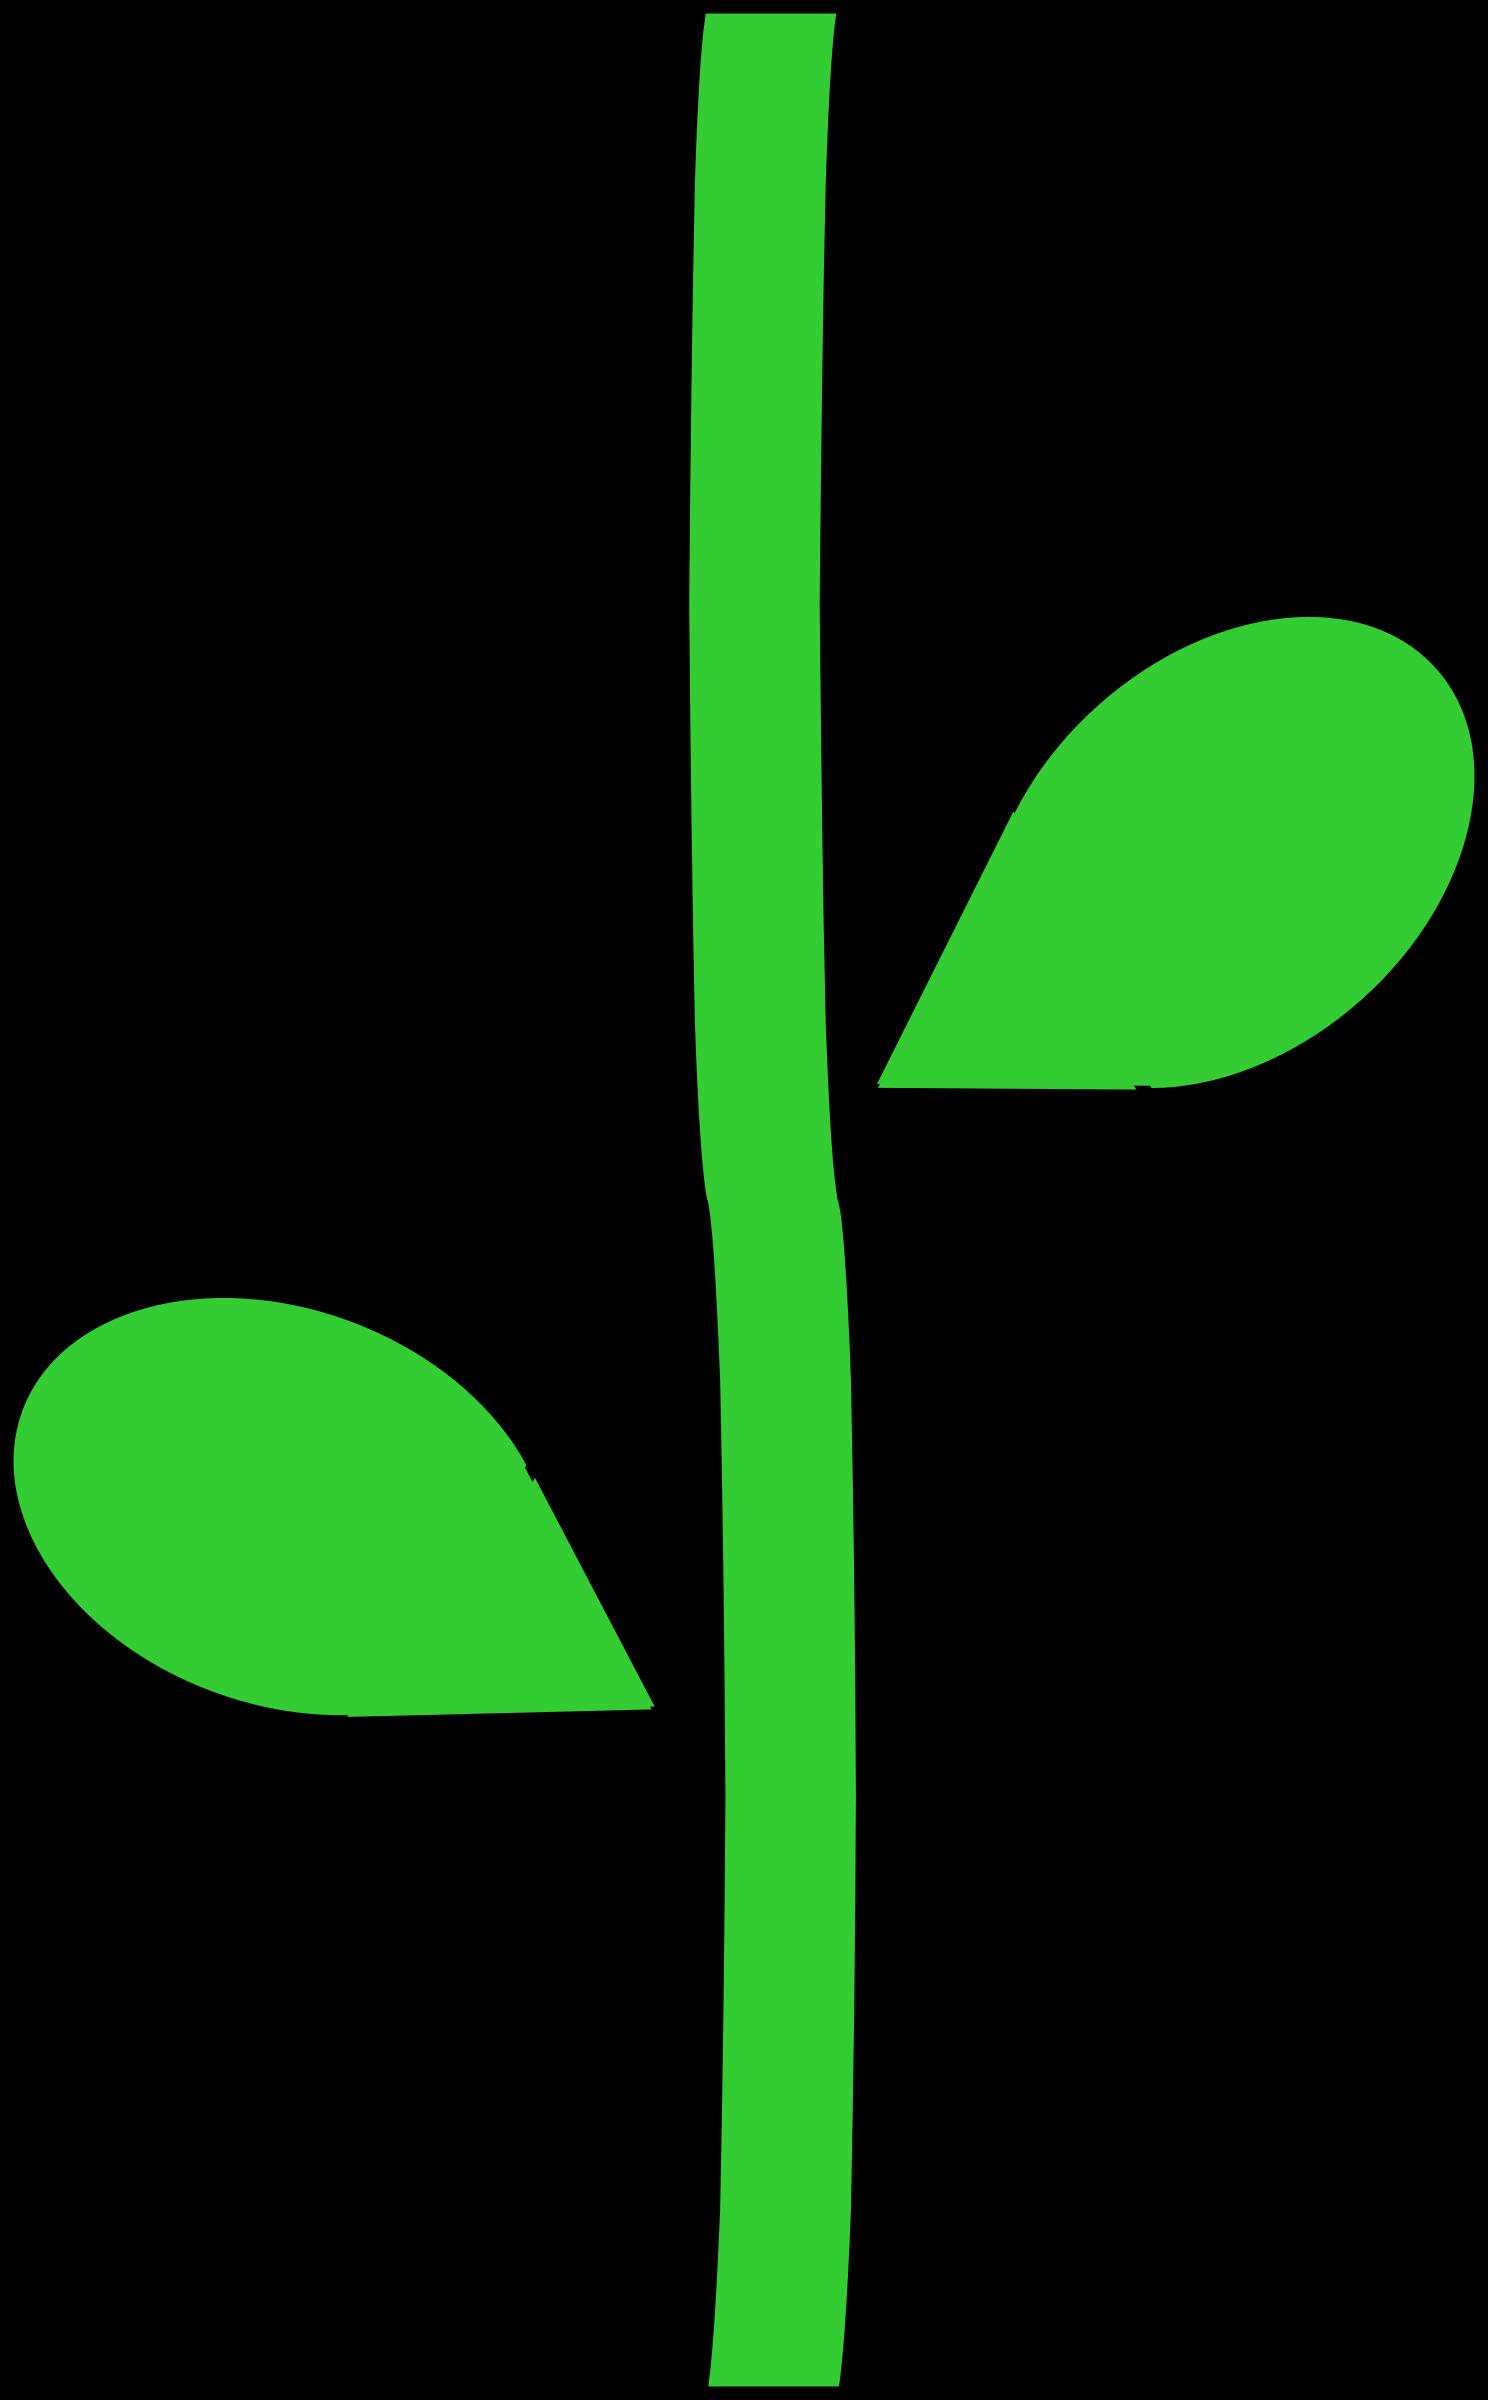 Flower Stem by @barnheartowl, A green flower stem, on.